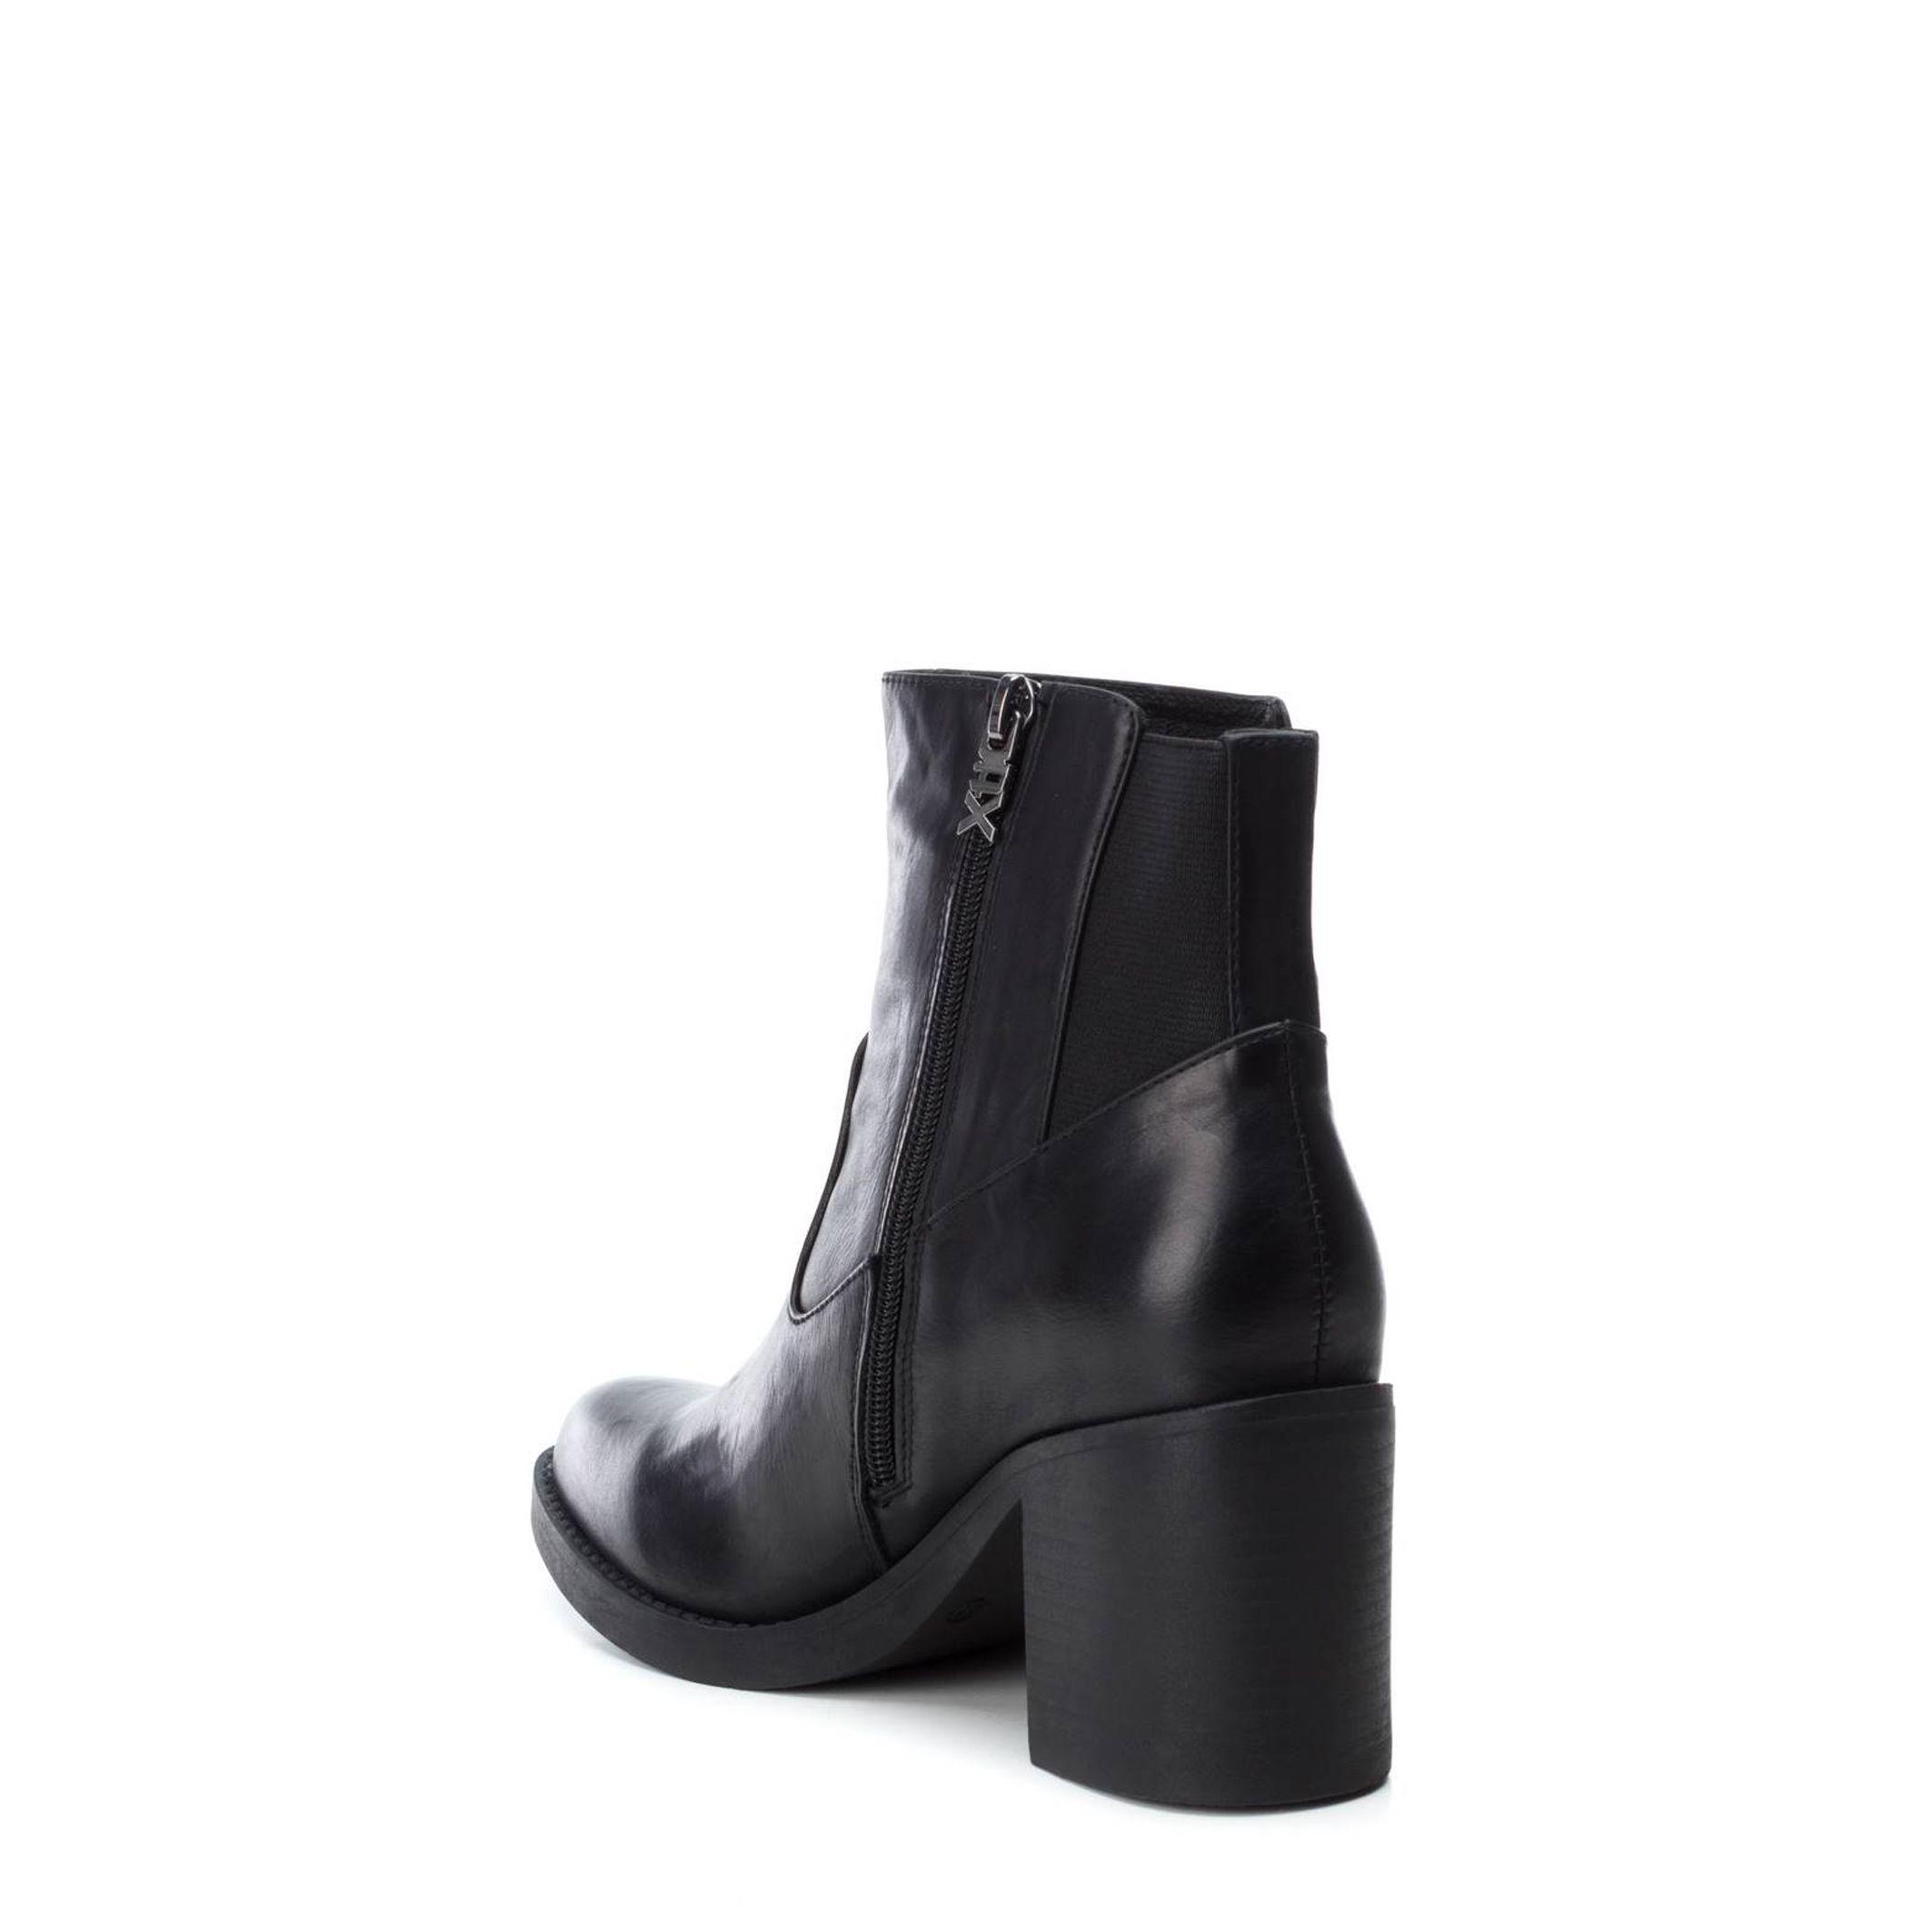 Schuhe Xti – 49438 – Schwarz